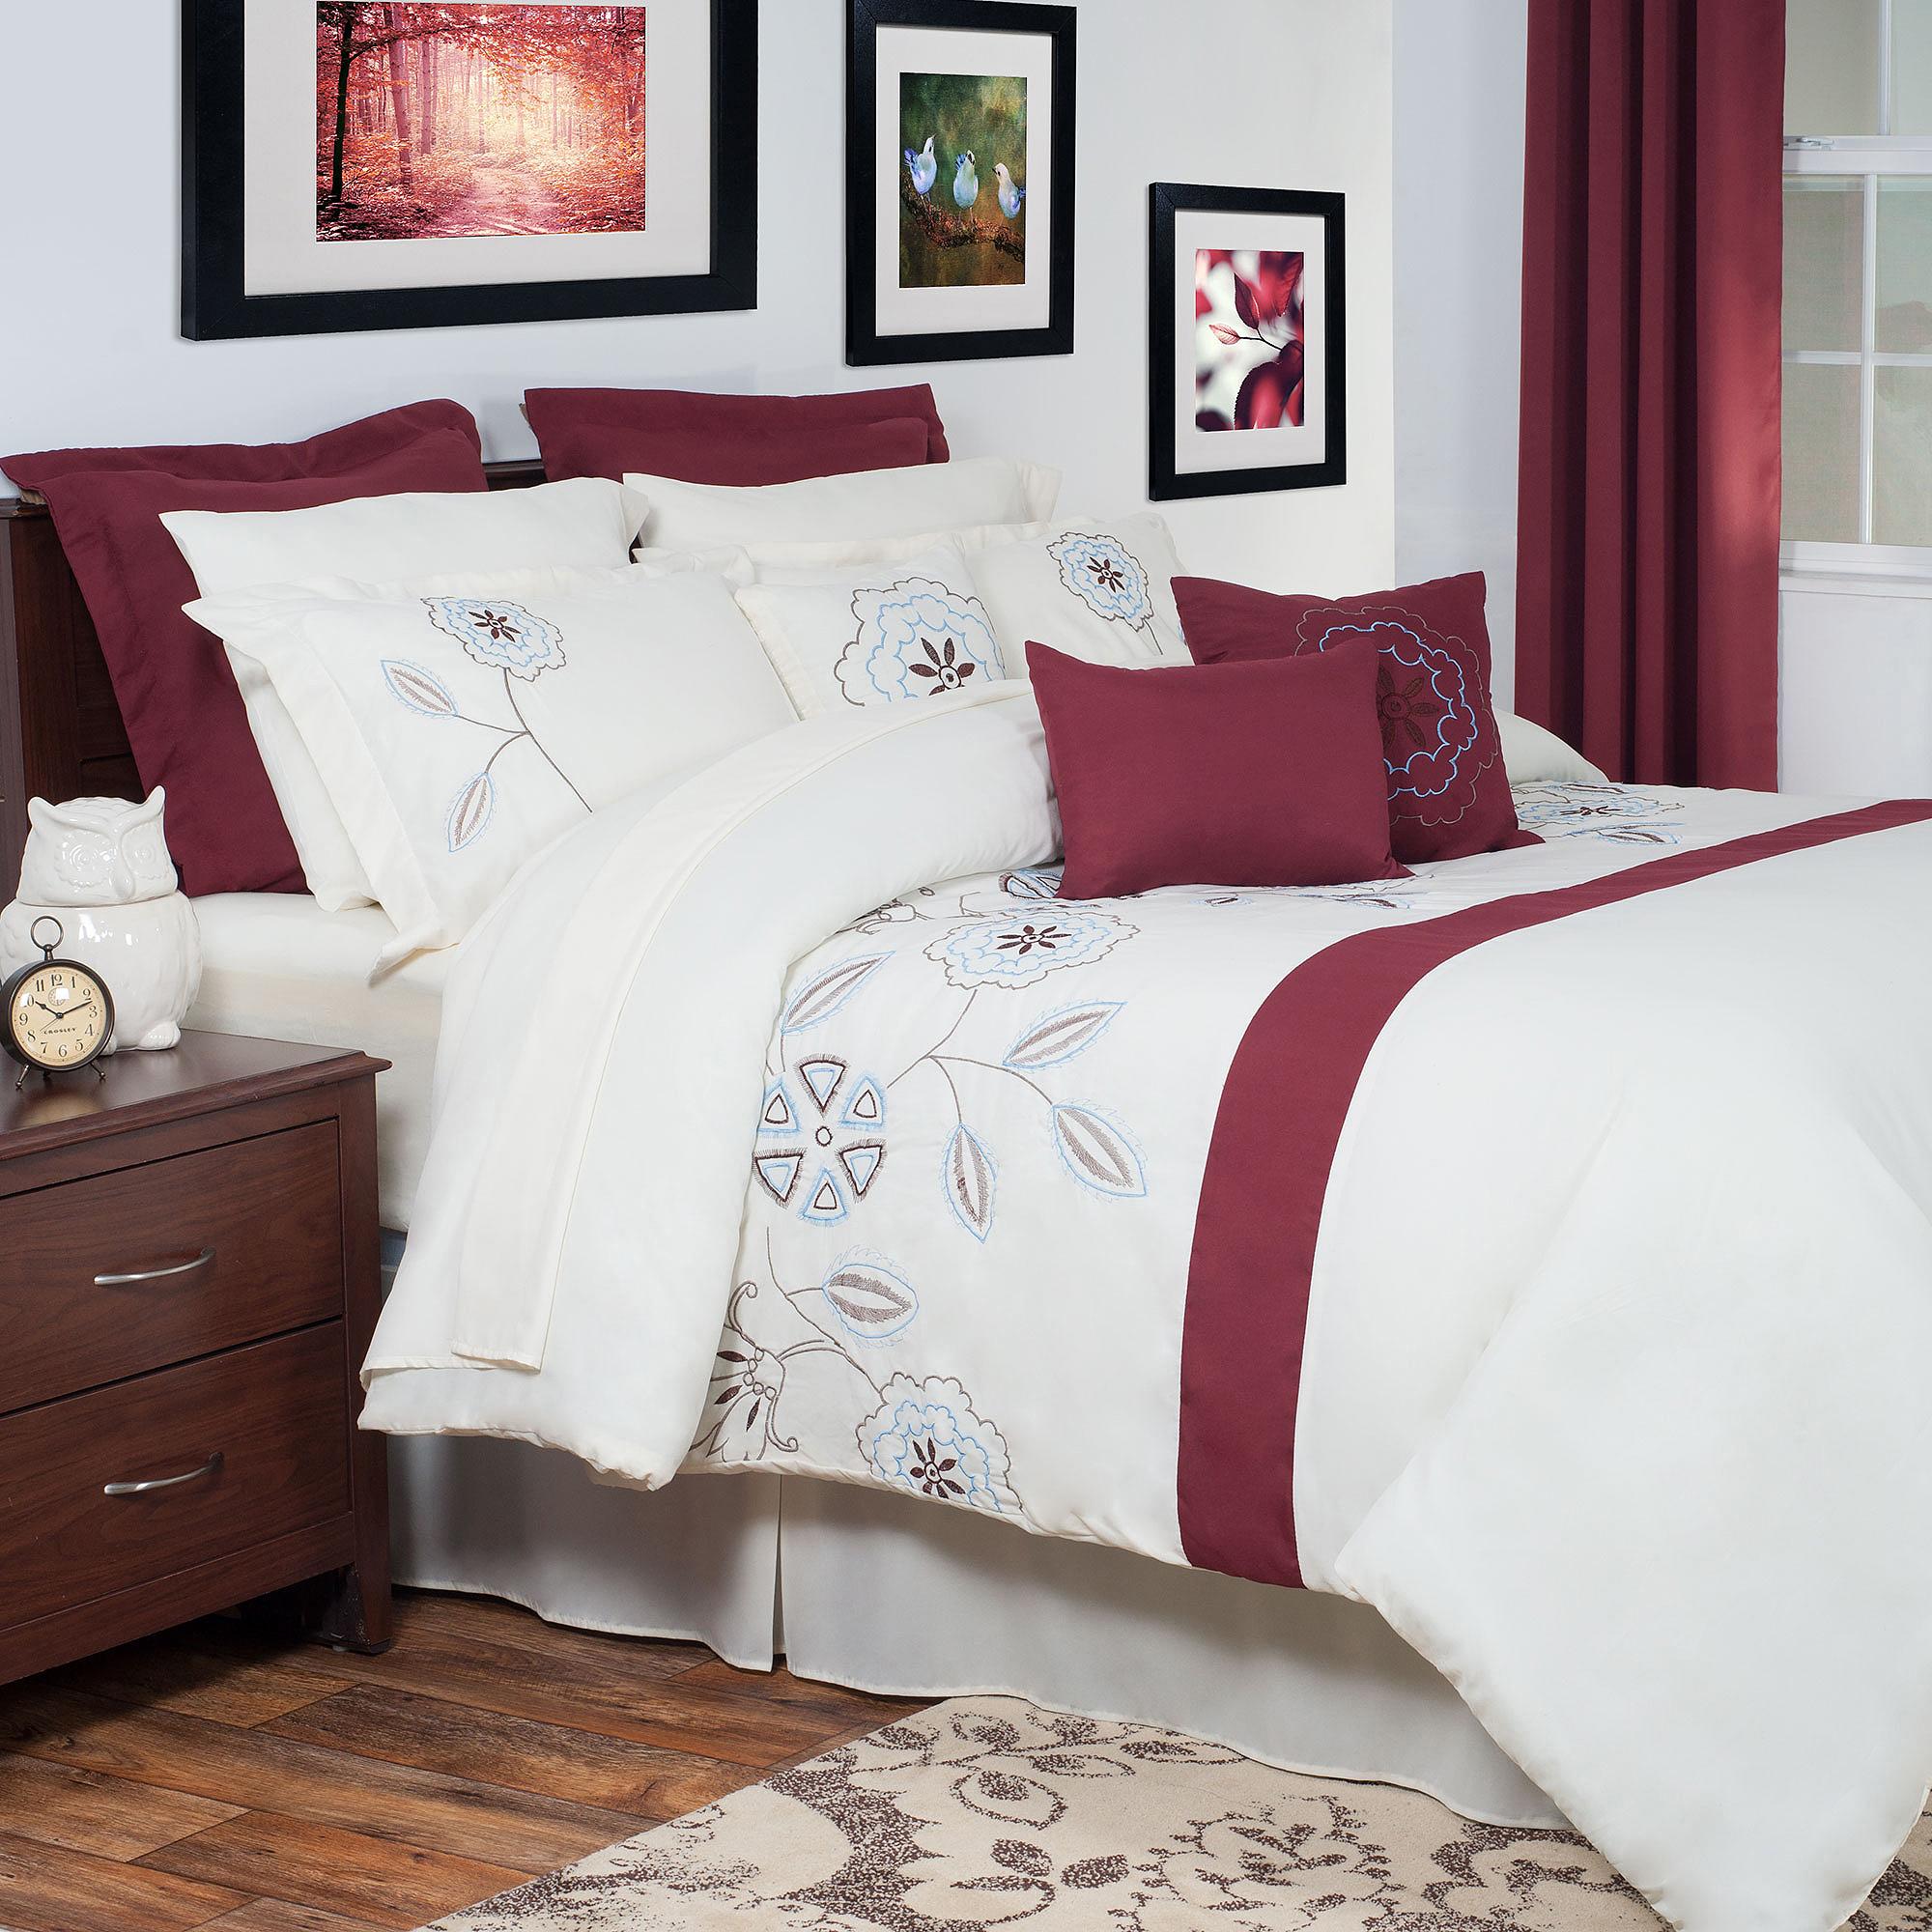 Somerset Home Olivia 13-Piece Oversized Embroidered Bedding Comforter Set